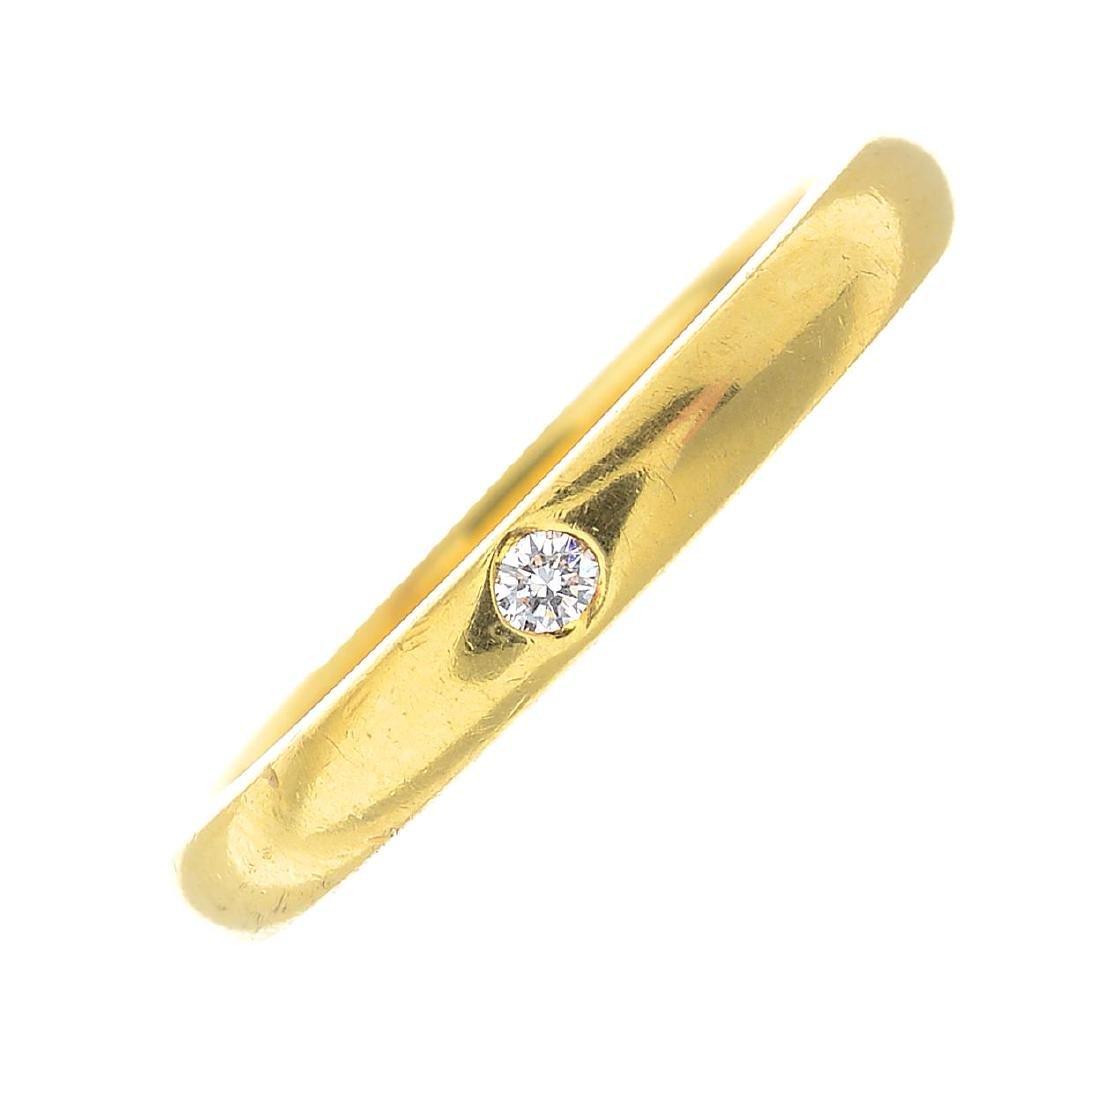 TIFFANY & CO. - a diamond band ring. The brilliant-cut